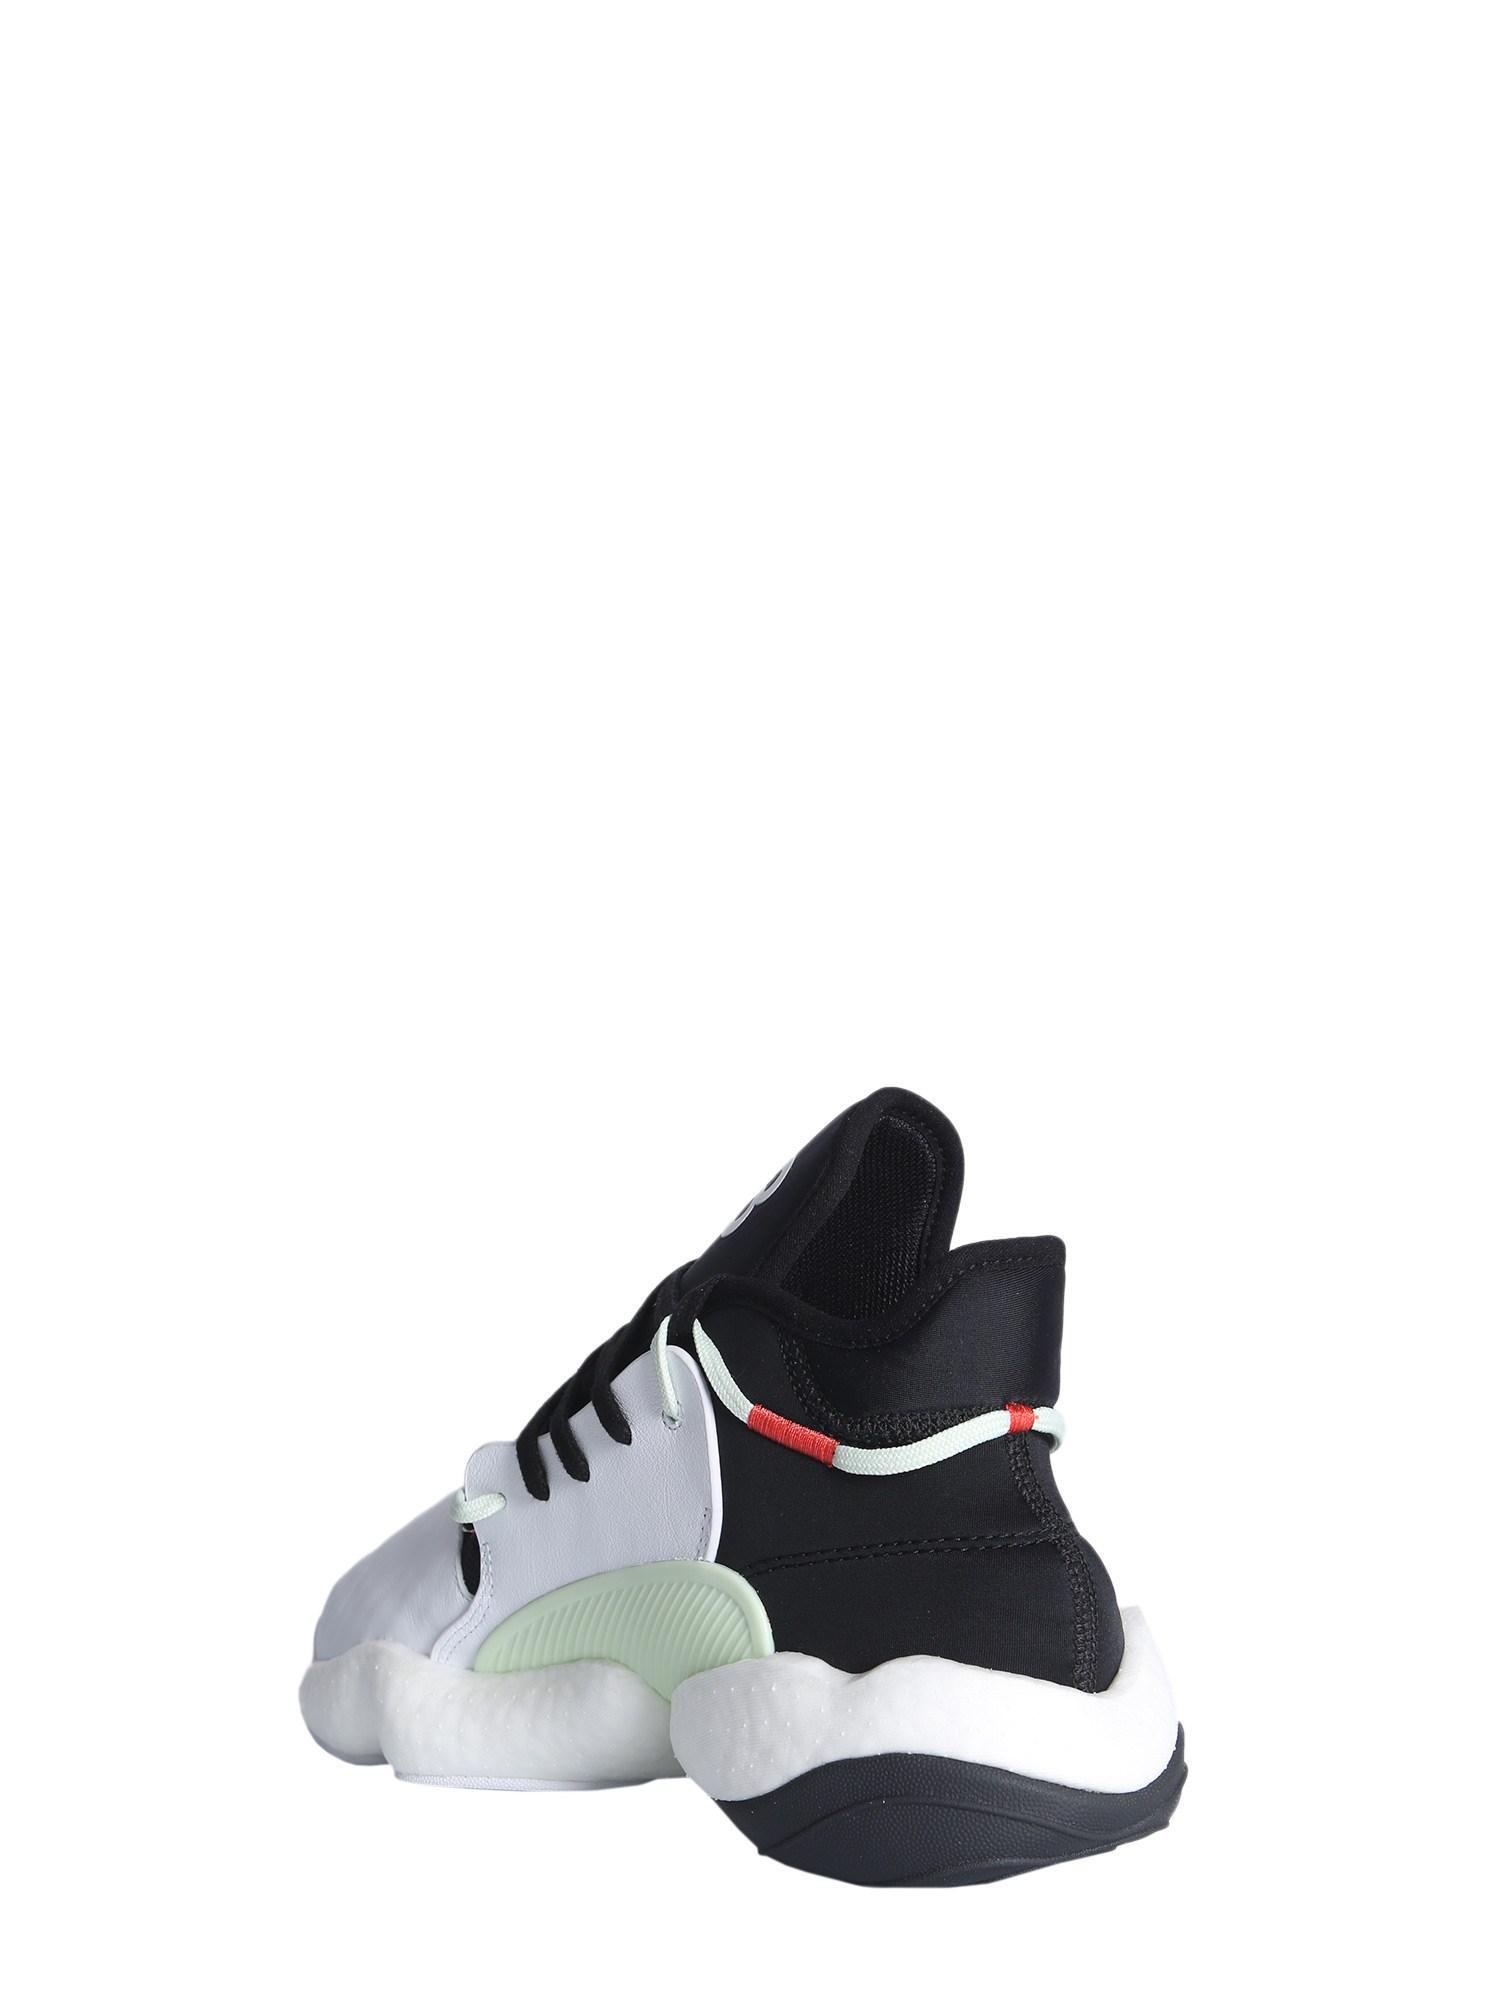 quality design c67a8 34bf2 Y-3 Sneaker Byw Bball In Neoprene E Pelle for Men - Lyst